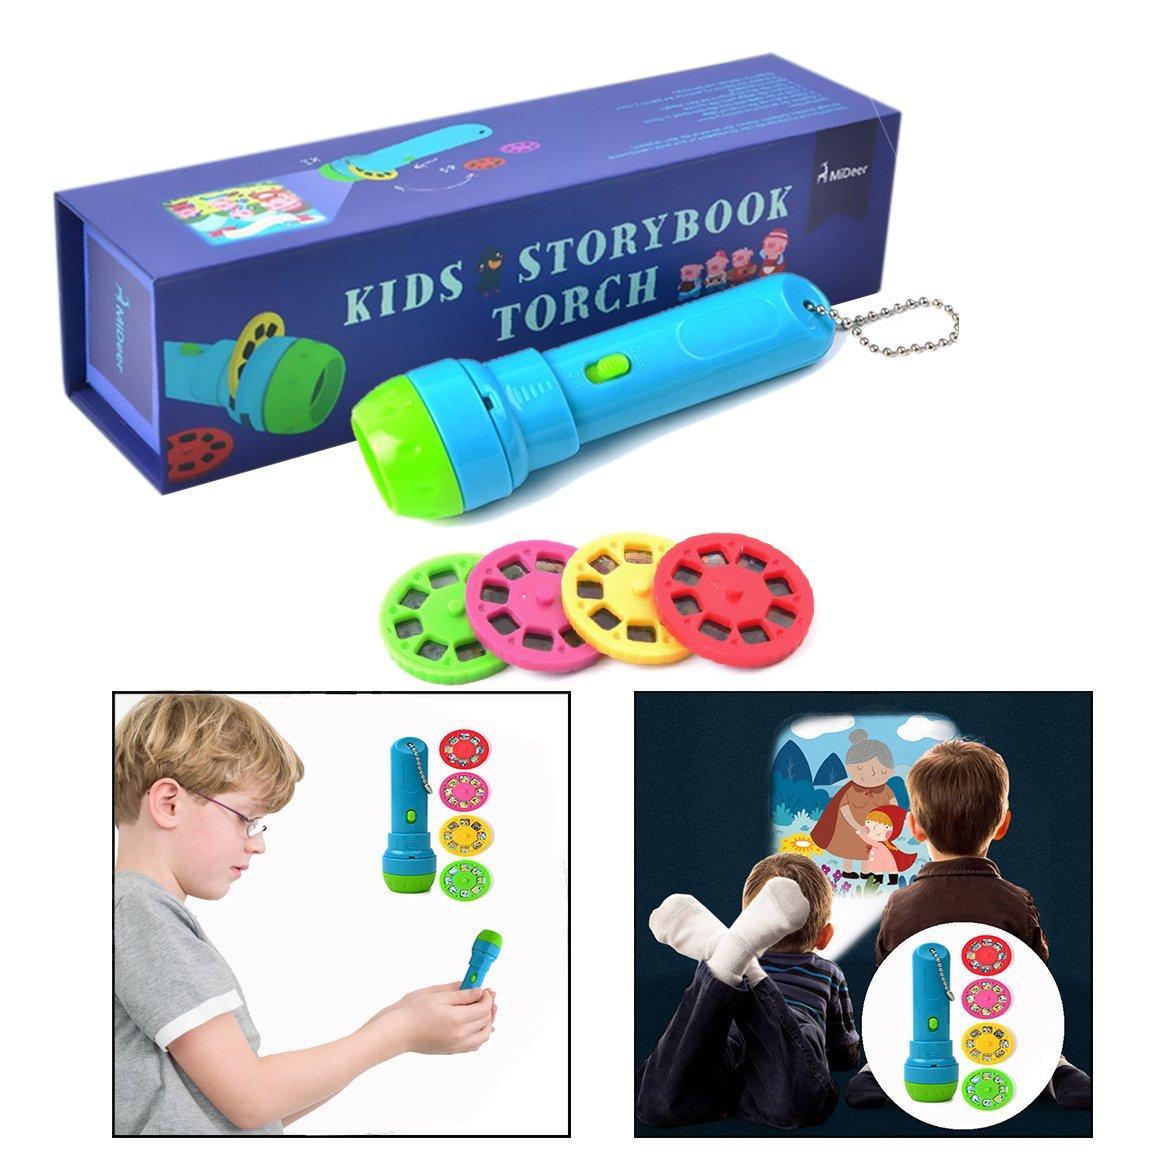 XLKJストーリー投影懐中電灯投影トーチのおもちゃ子供の睡眠ストーリーショー32スライド4子供のためのおとぎ話の映画。 B07K444ZQC